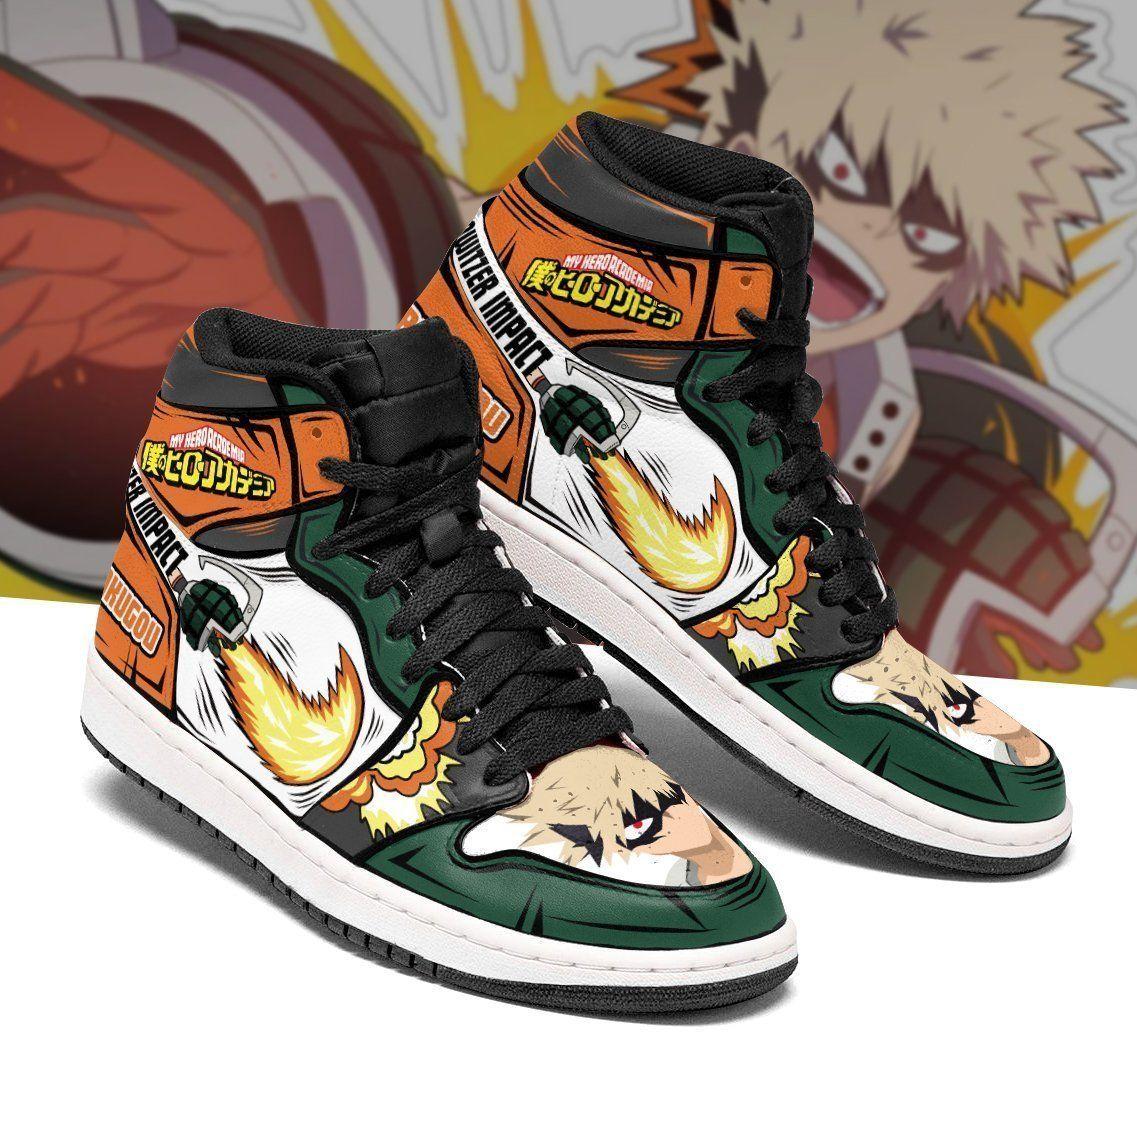 Katsuki Bakugou Shoes Boots Skill My Hero Academia